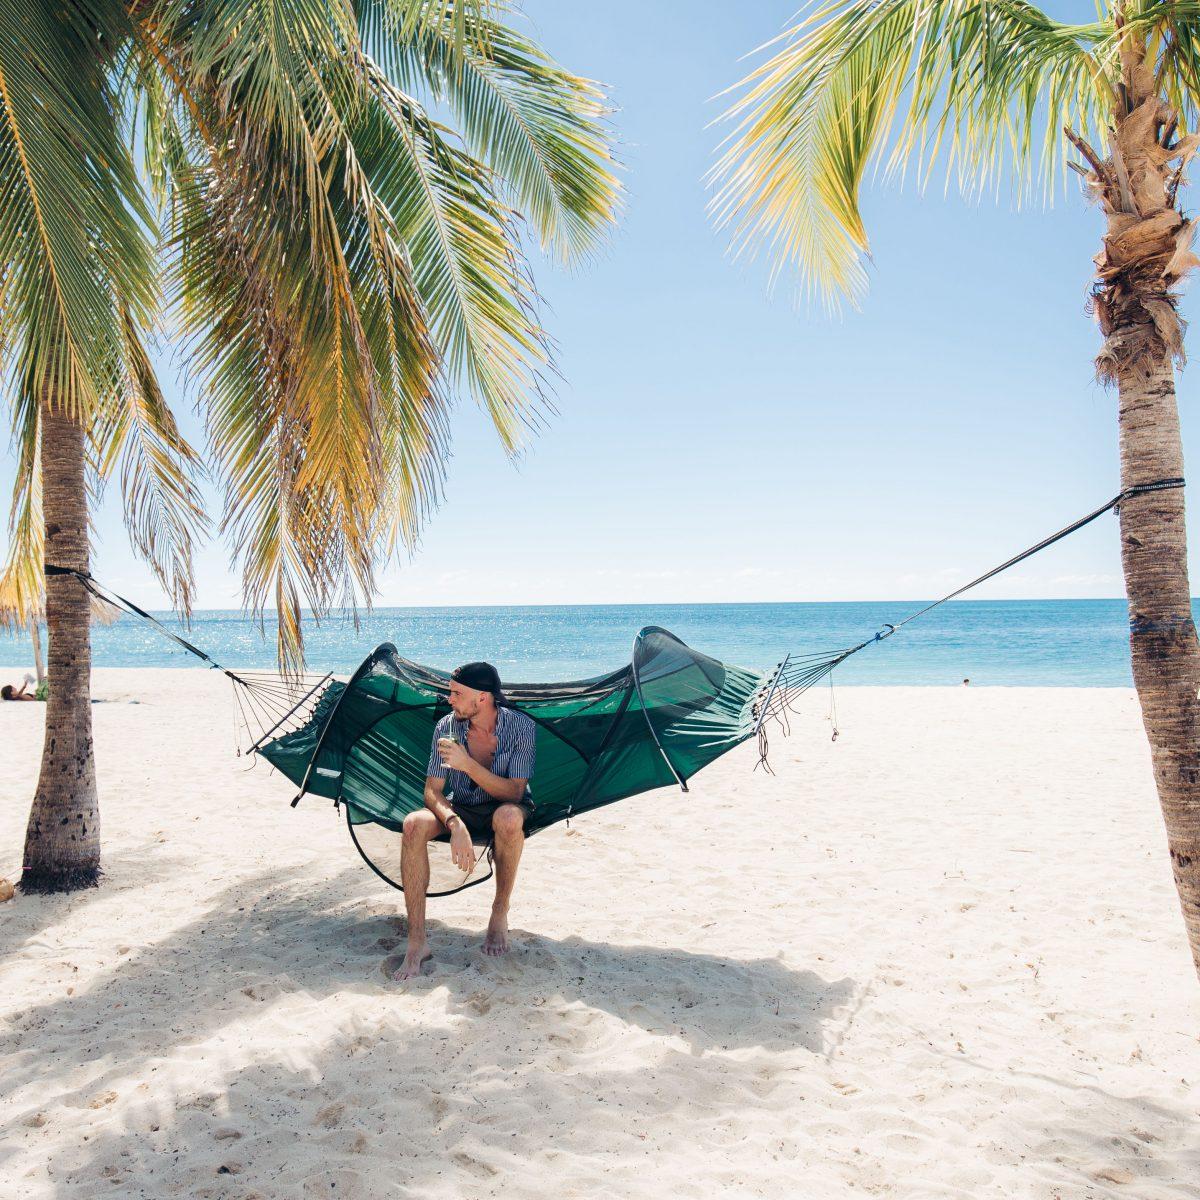 lawson hammock straps beach